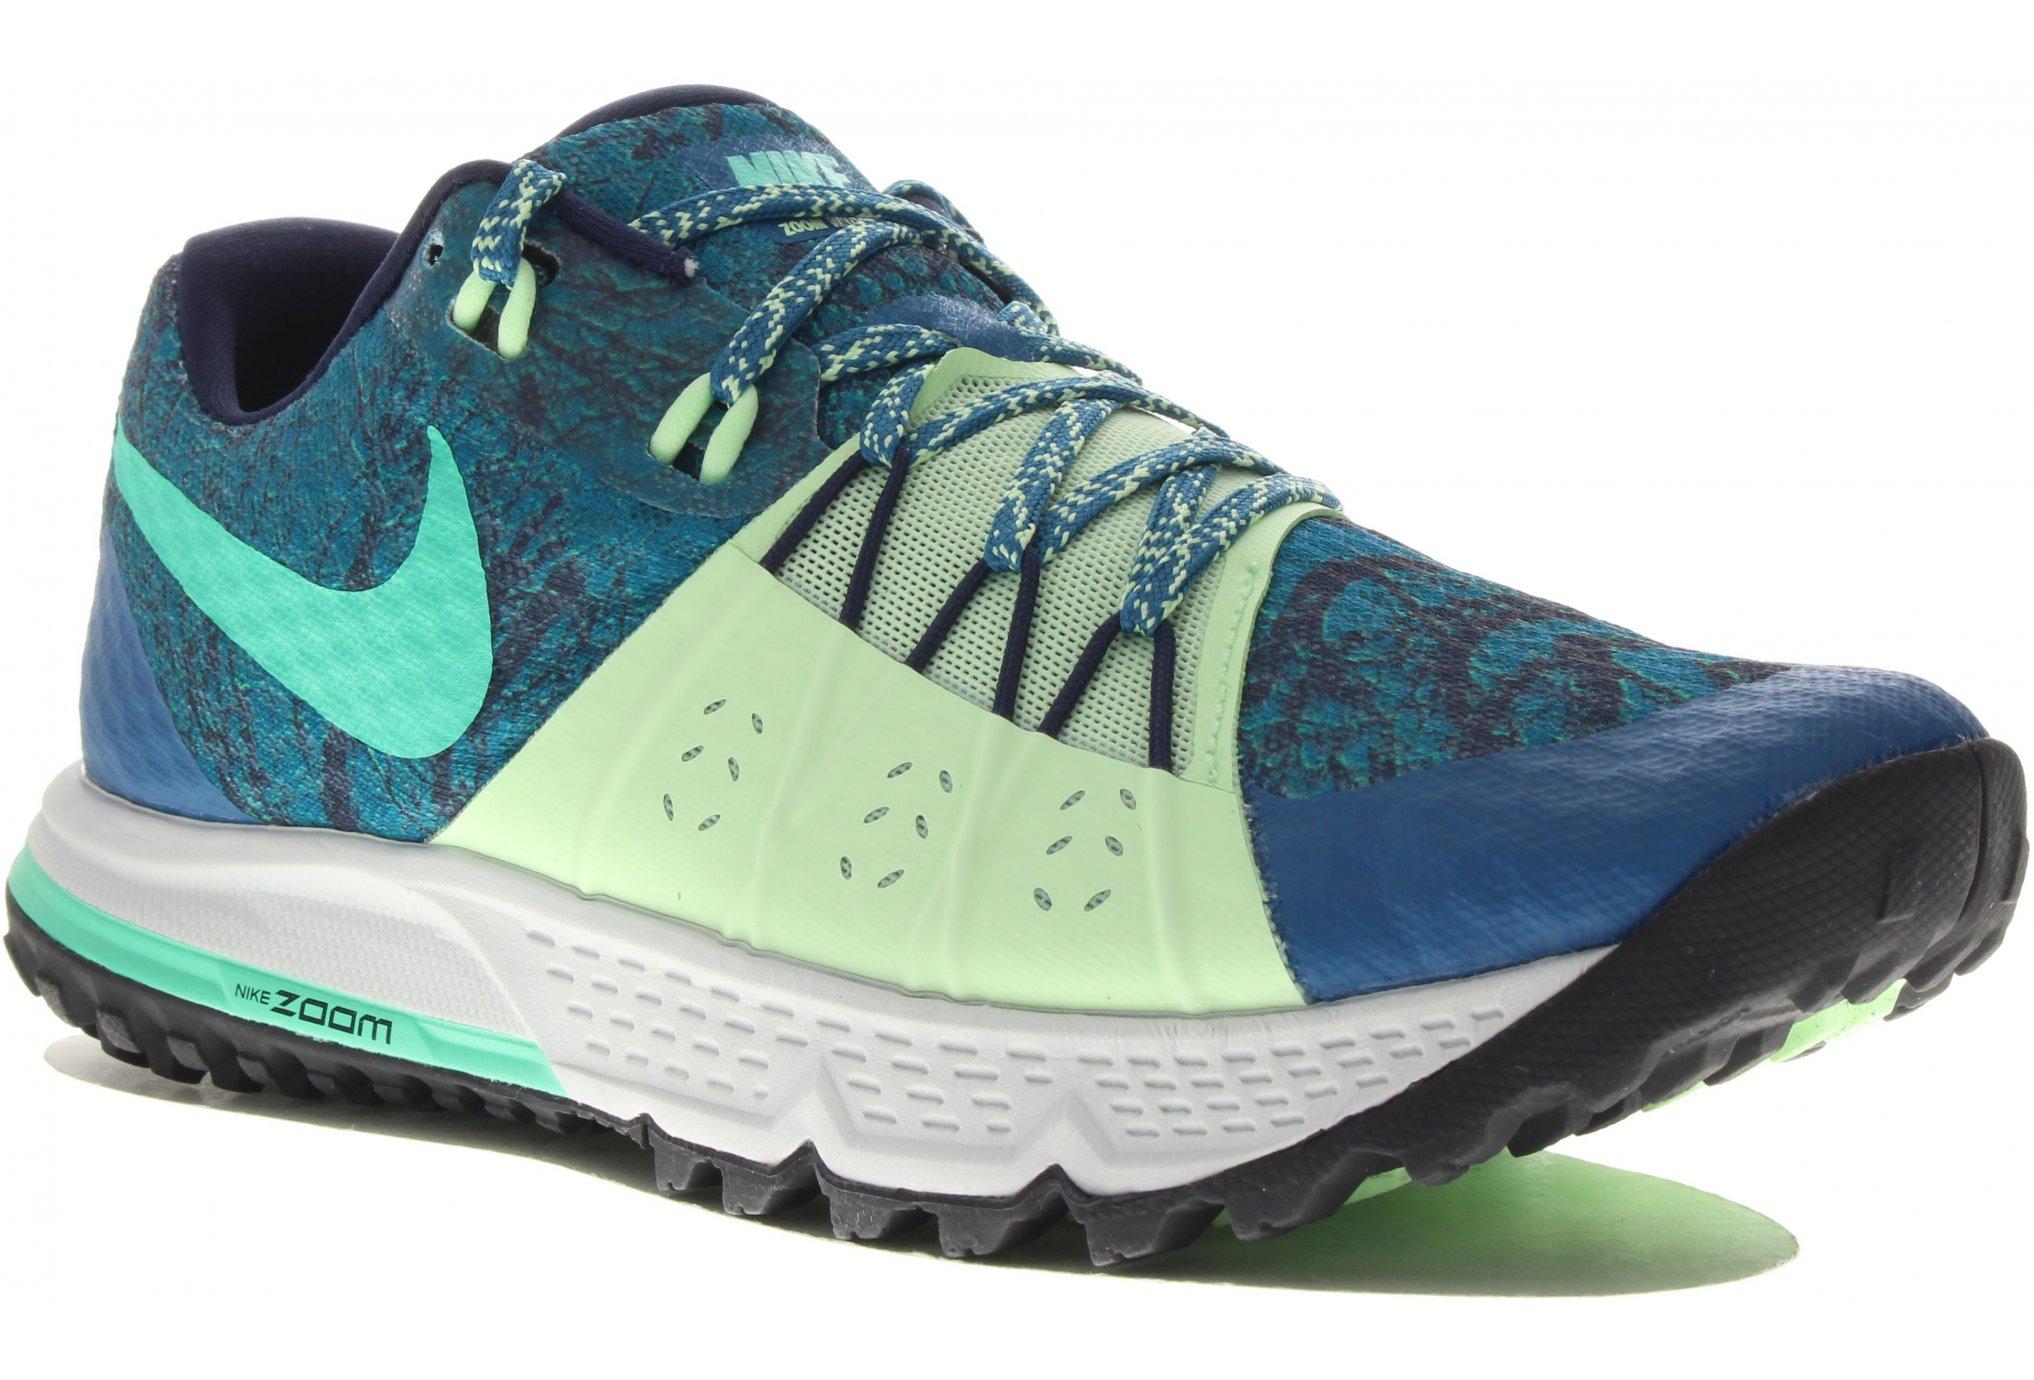 new styles bedf8 6bada Nike Air Zoom Wildhorse 4 W Chaussures running femme